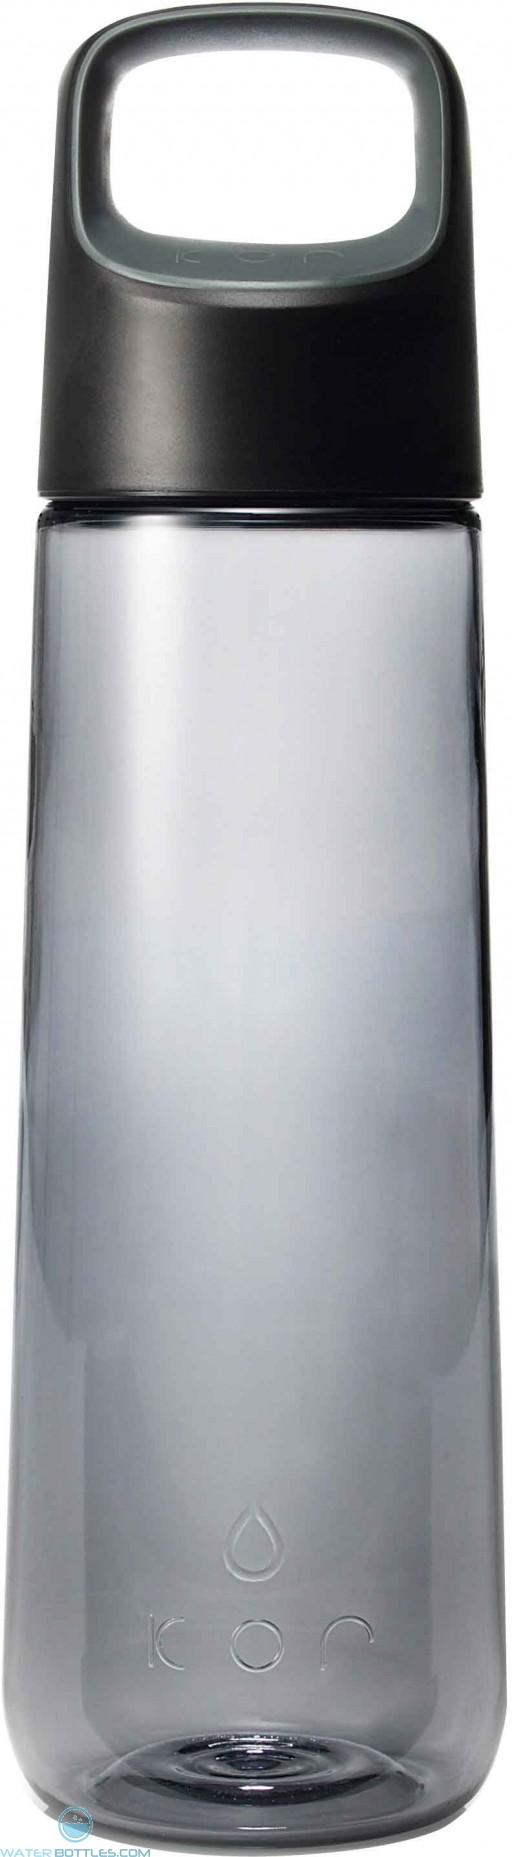 KOR Aura Bottles   25 oz - Black